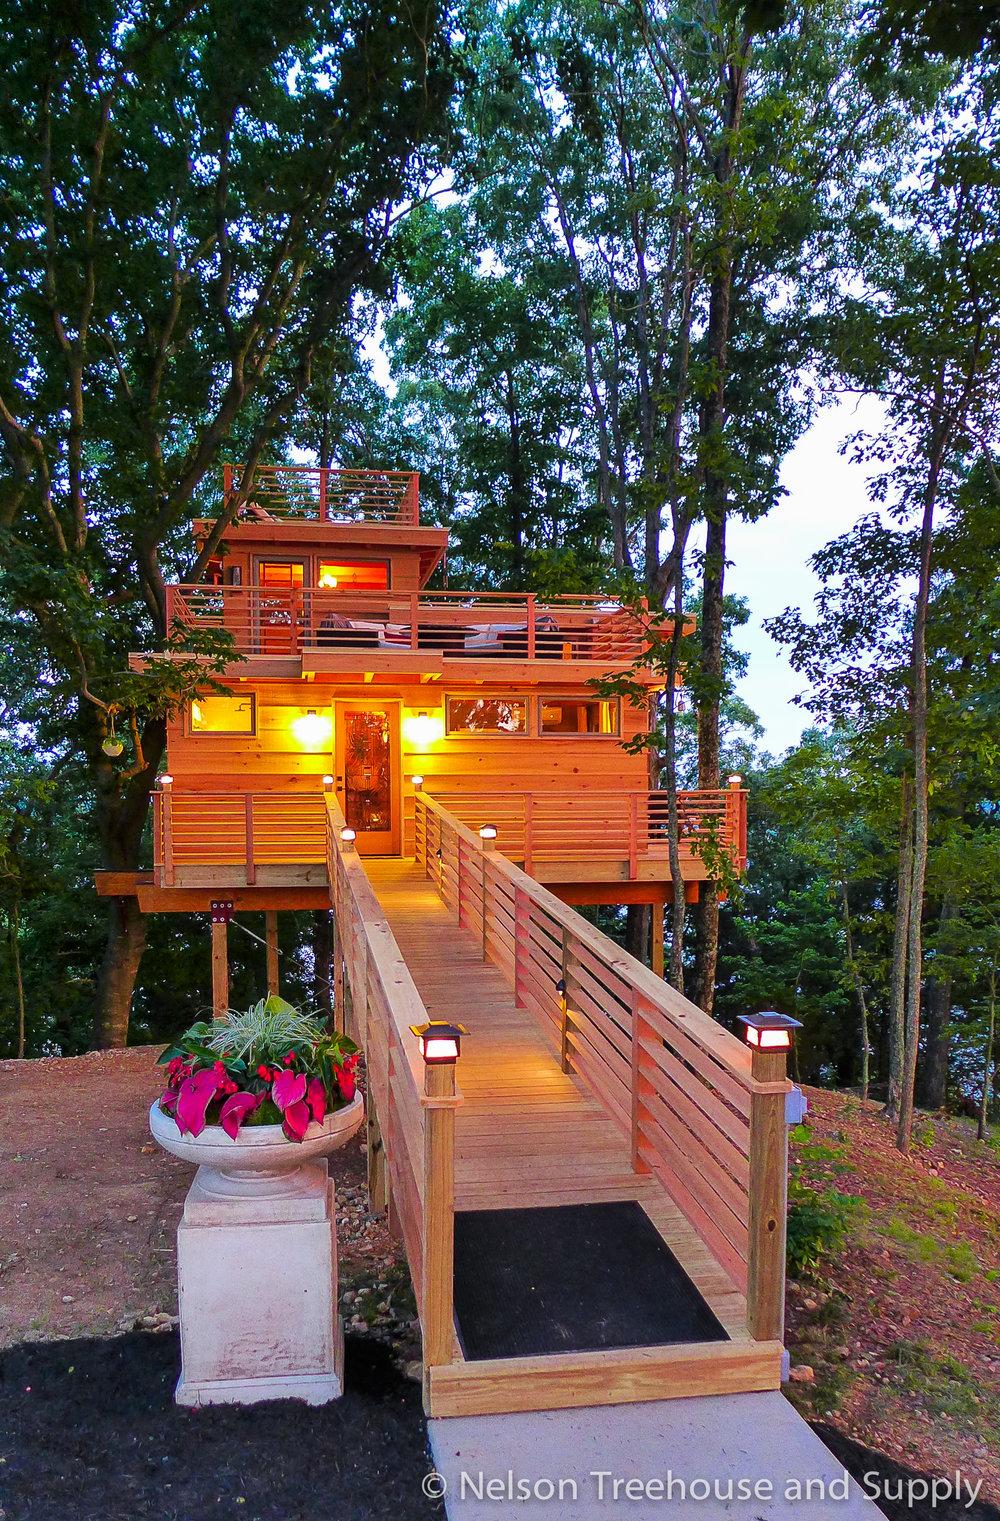 frank-lloyd-wright-treehouse-exterior-3